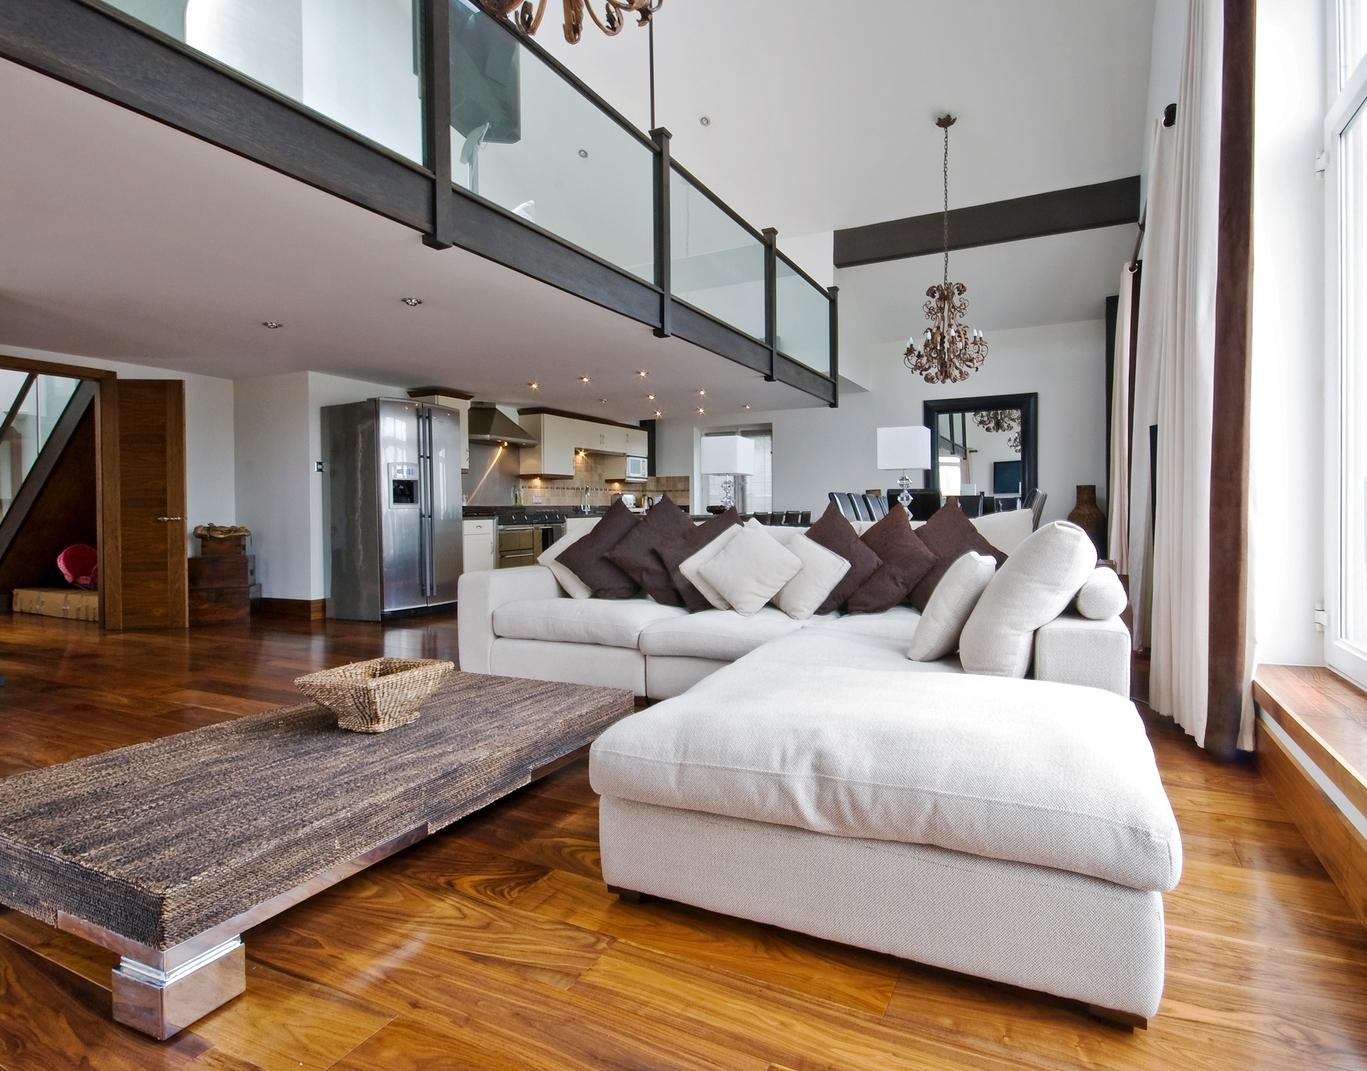 unique-bigstock-open-plan-living-room-inspiration